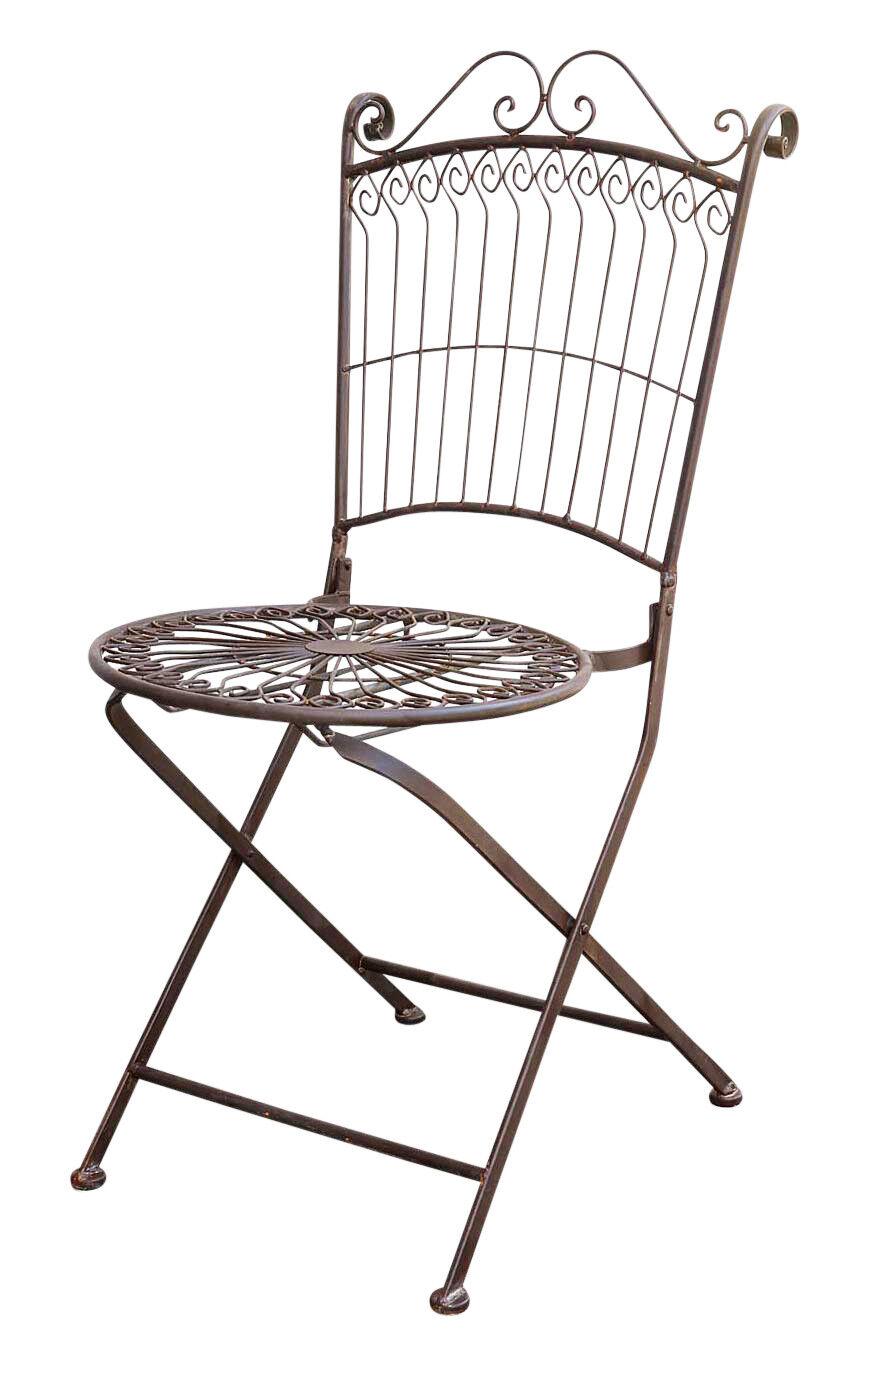 Silla de jardín silla silla plegable muebles de jardín nostalgia anitk-estilo metal marrón